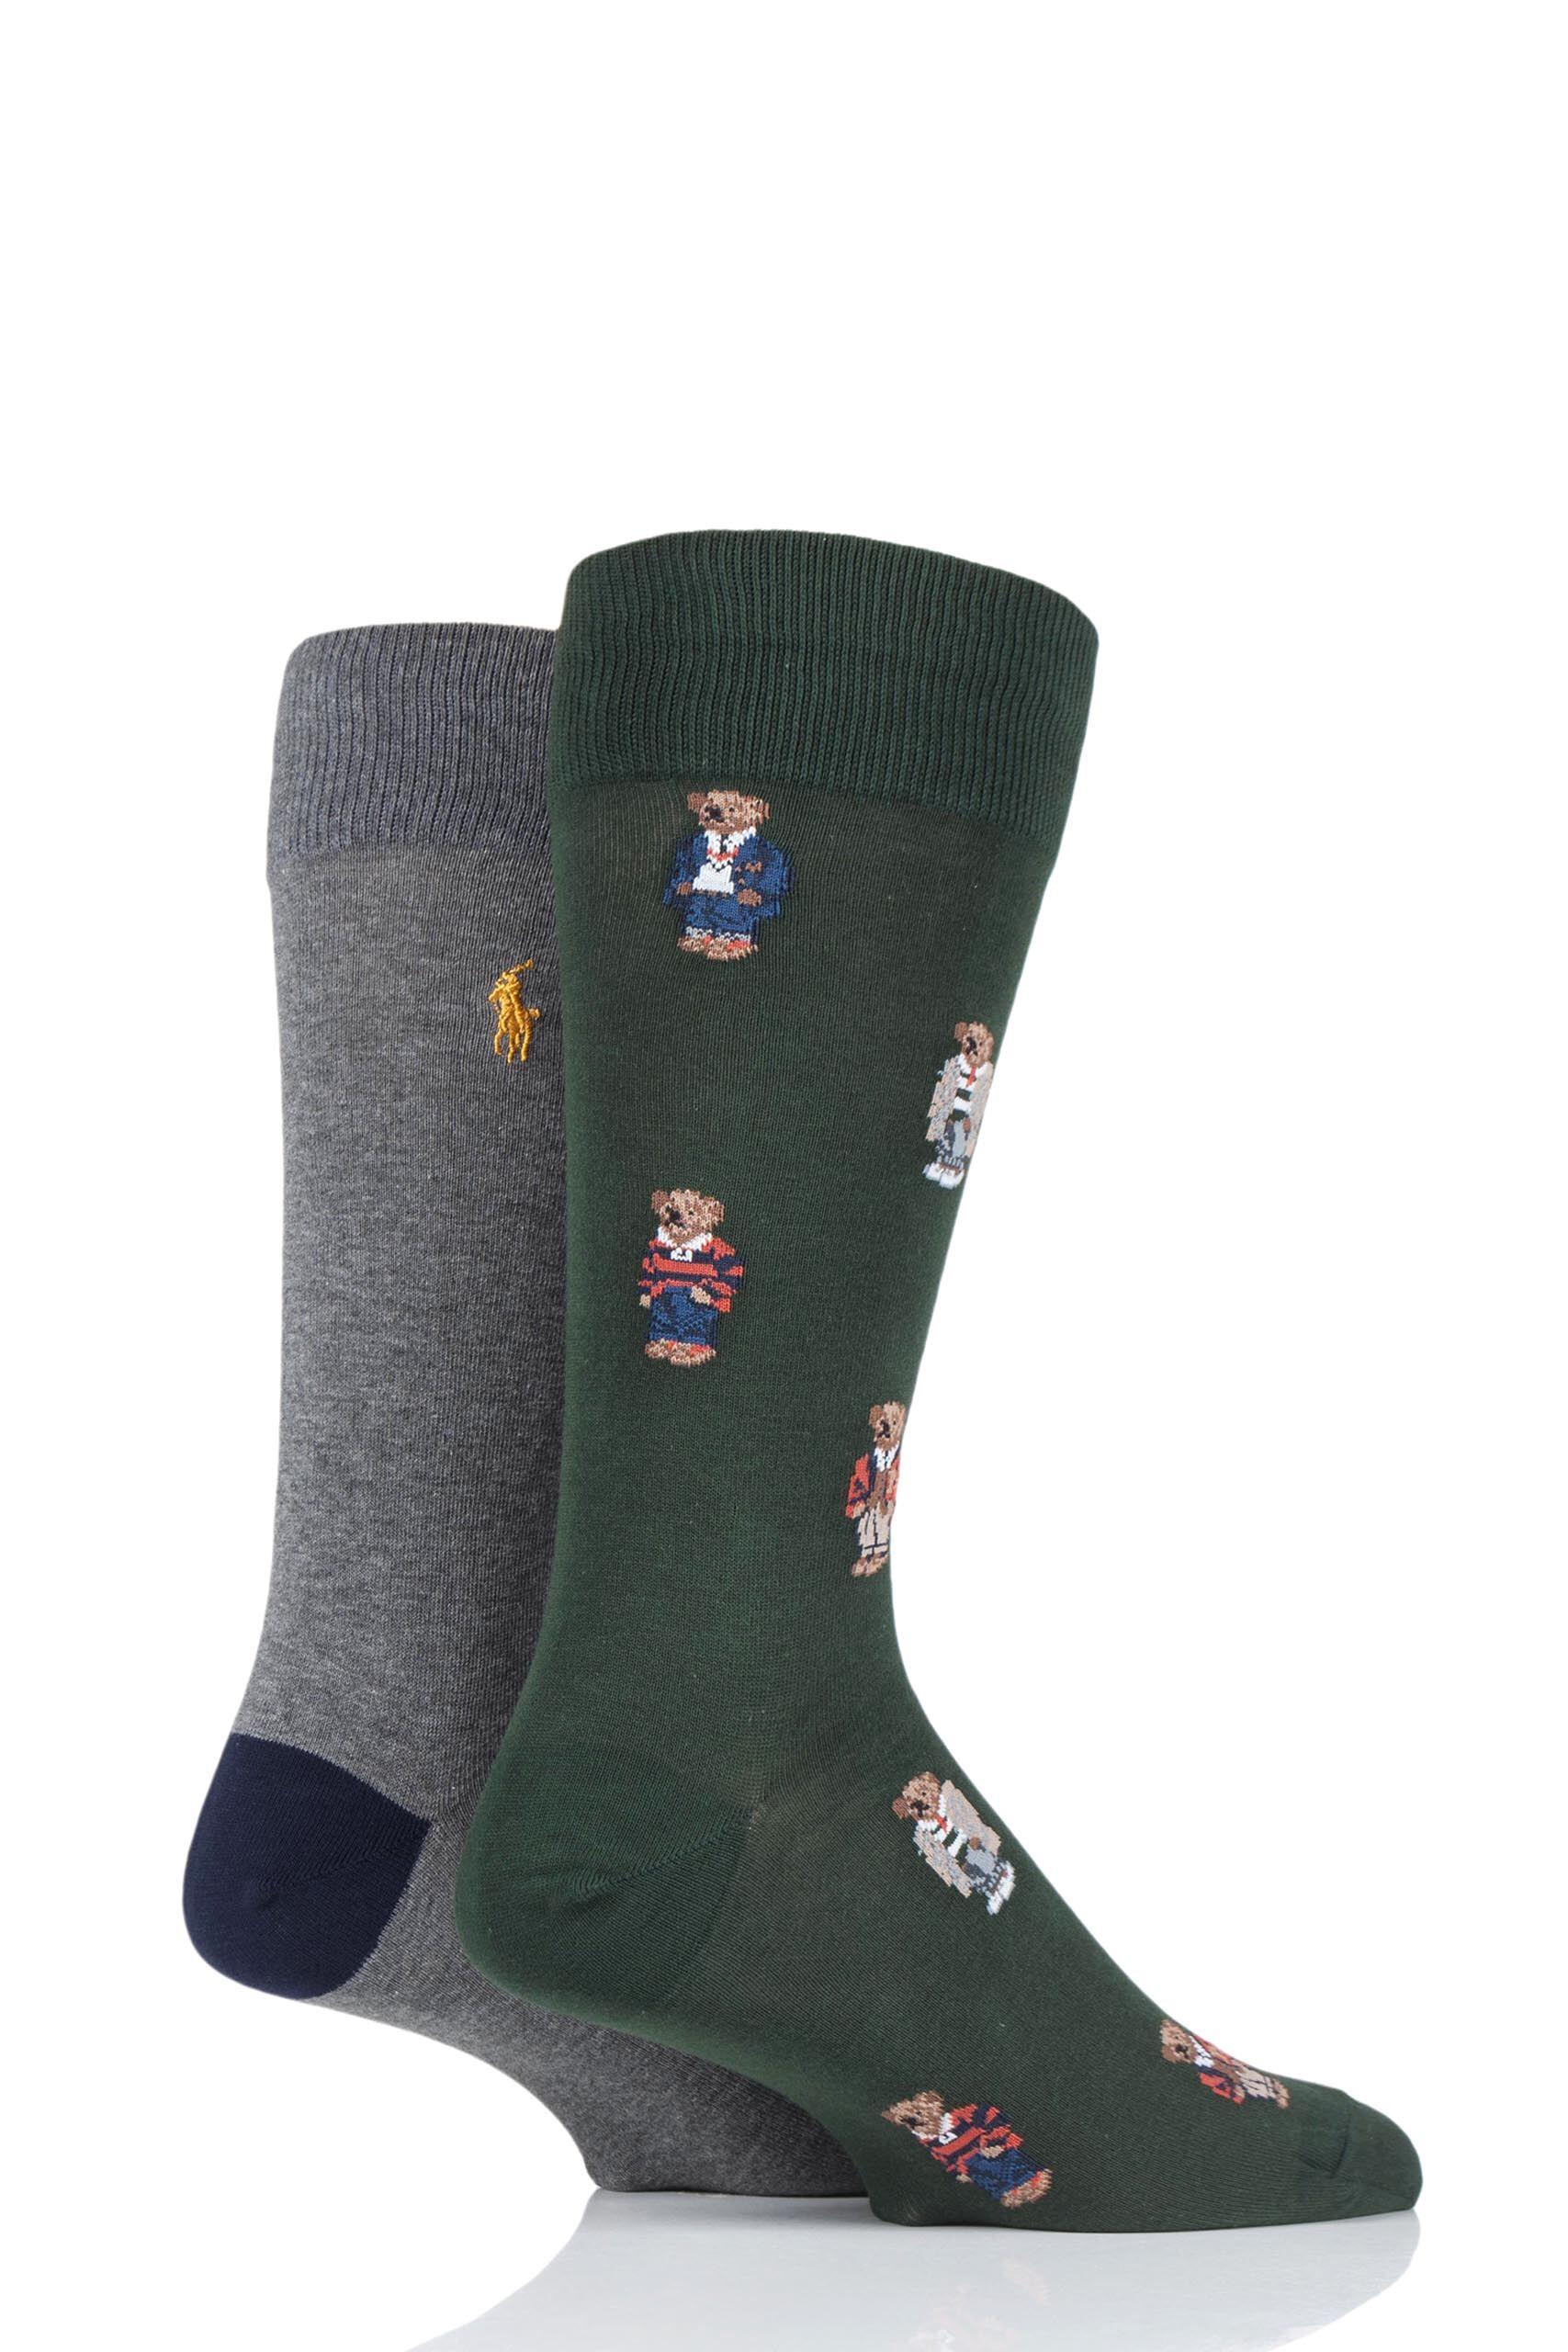 Image of 2 Pair Col Green/ Fost Grey/ Cru Nav 4 Bear Cotton Socks Men's 6-11 Mens - Ralph Lauren